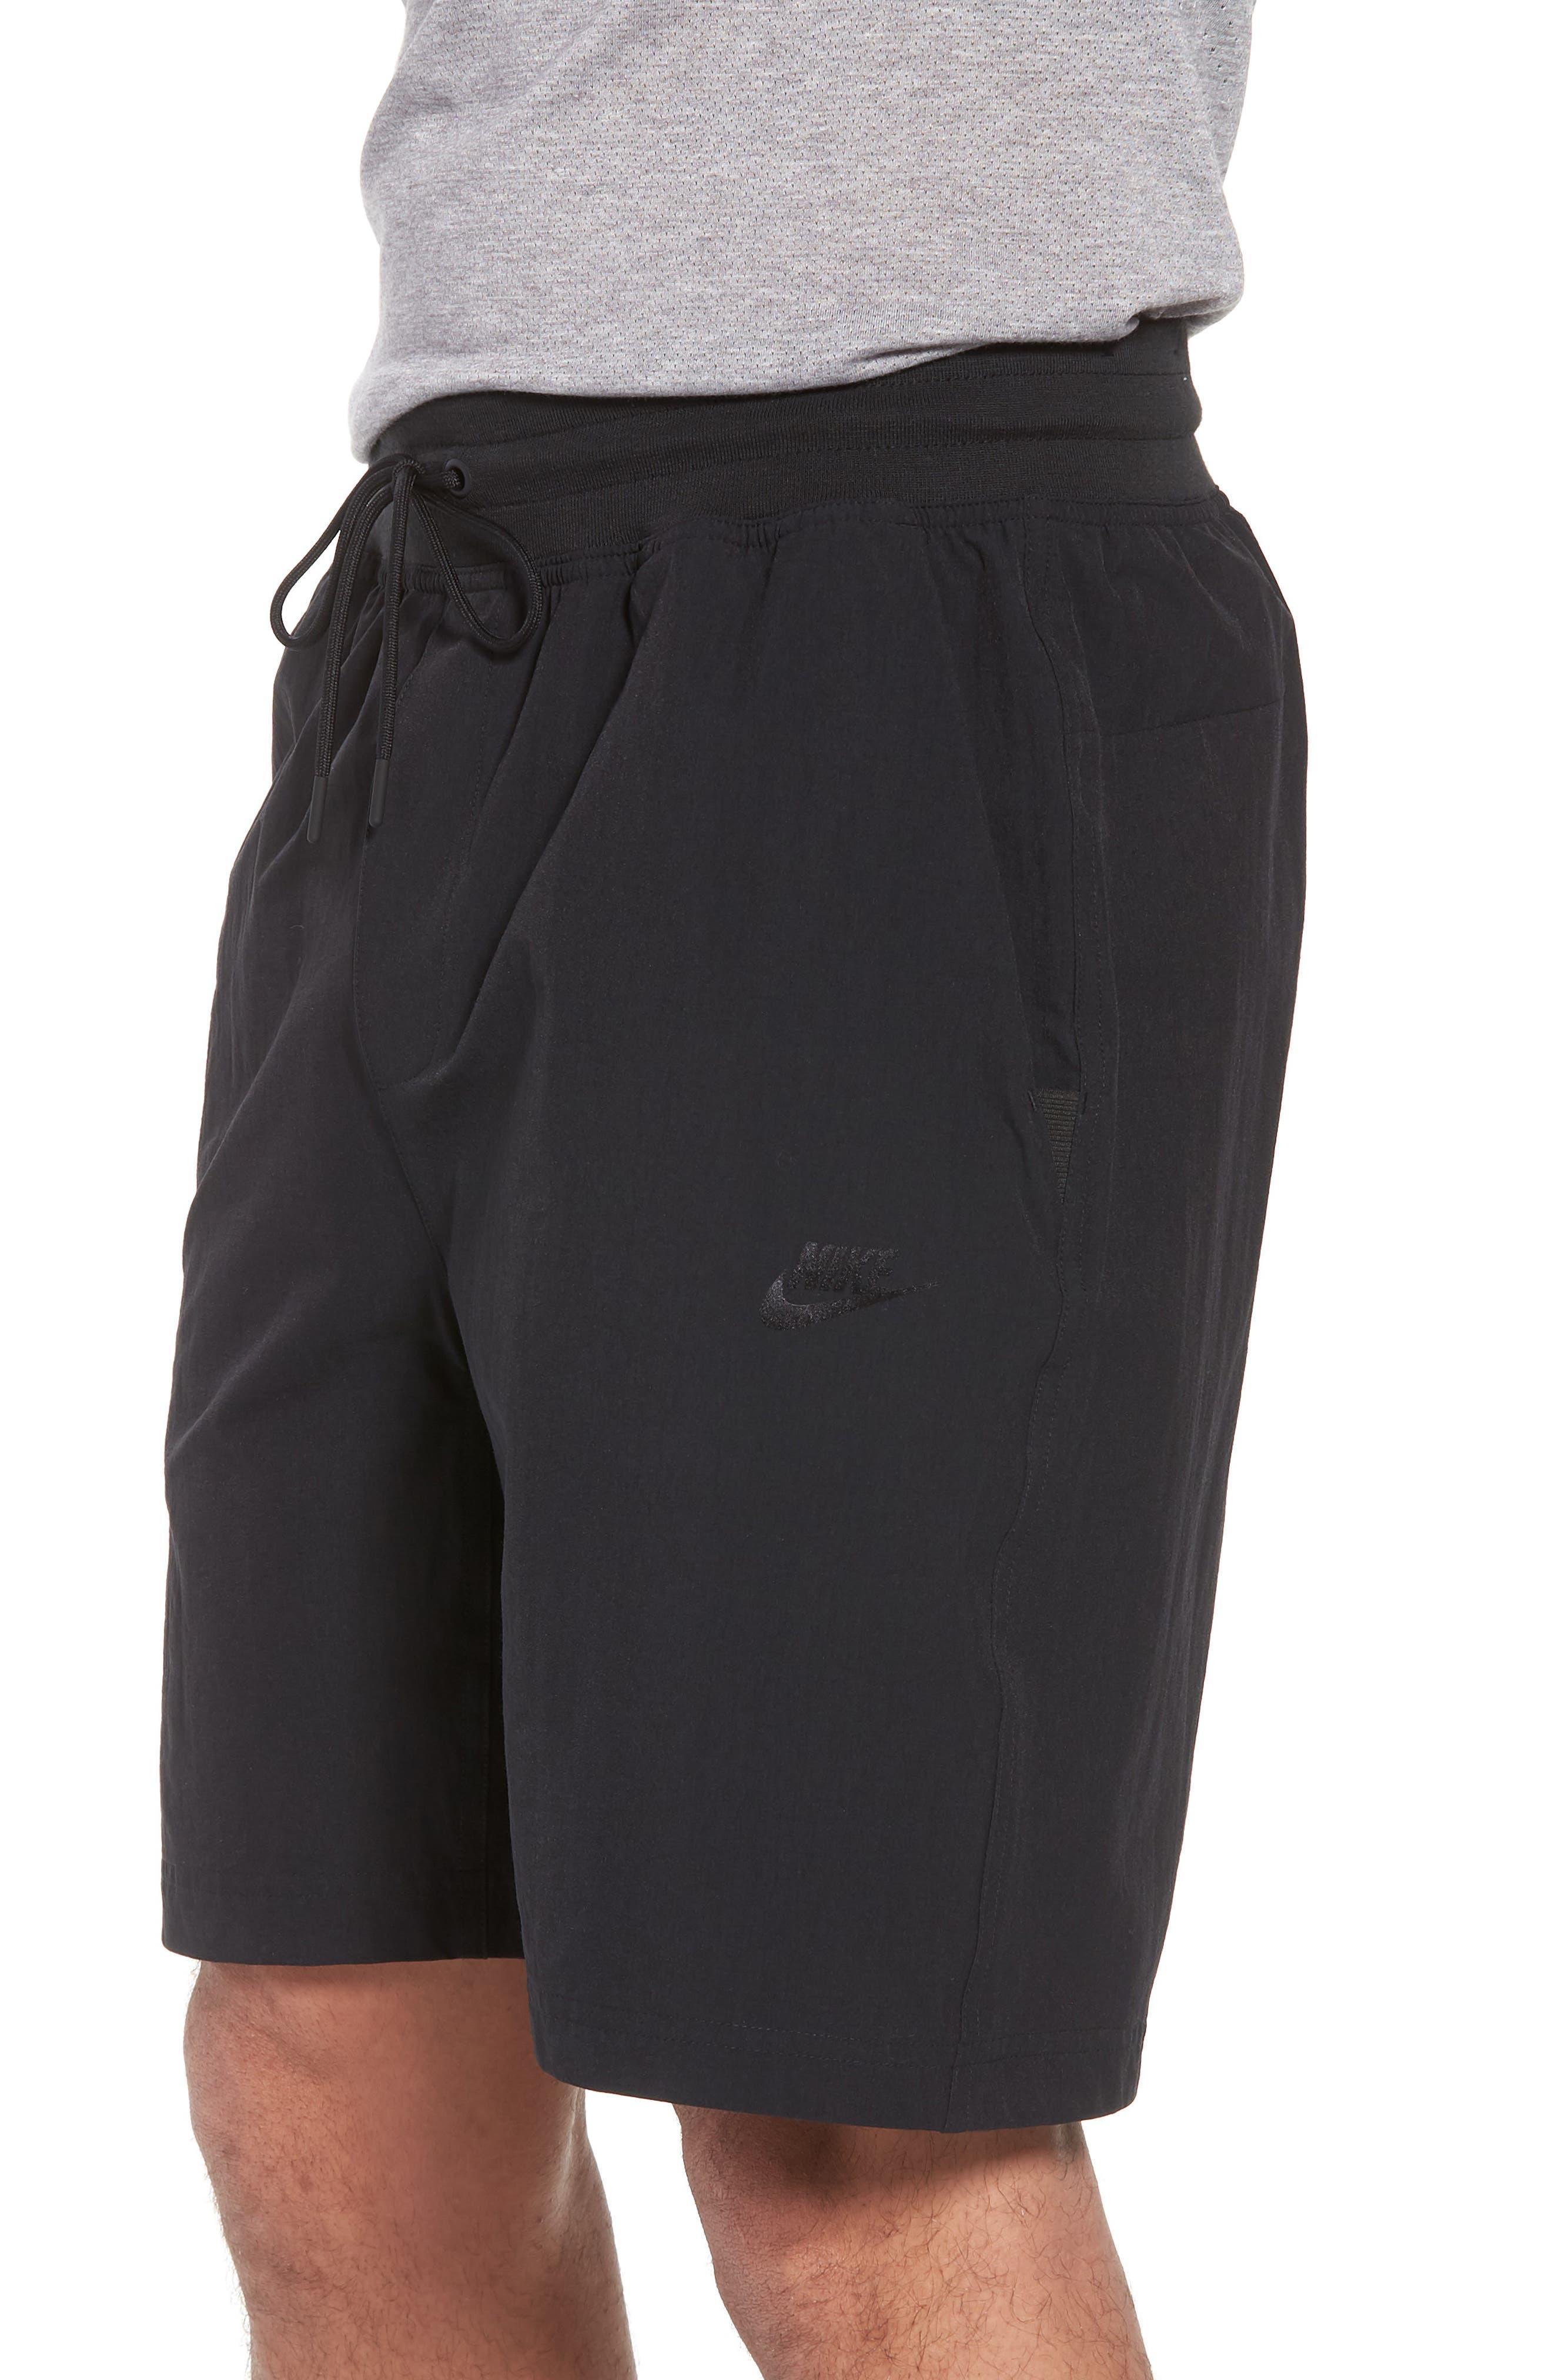 Sportswear Woven Shorts,                             Alternate thumbnail 3, color,                             Black/ Black